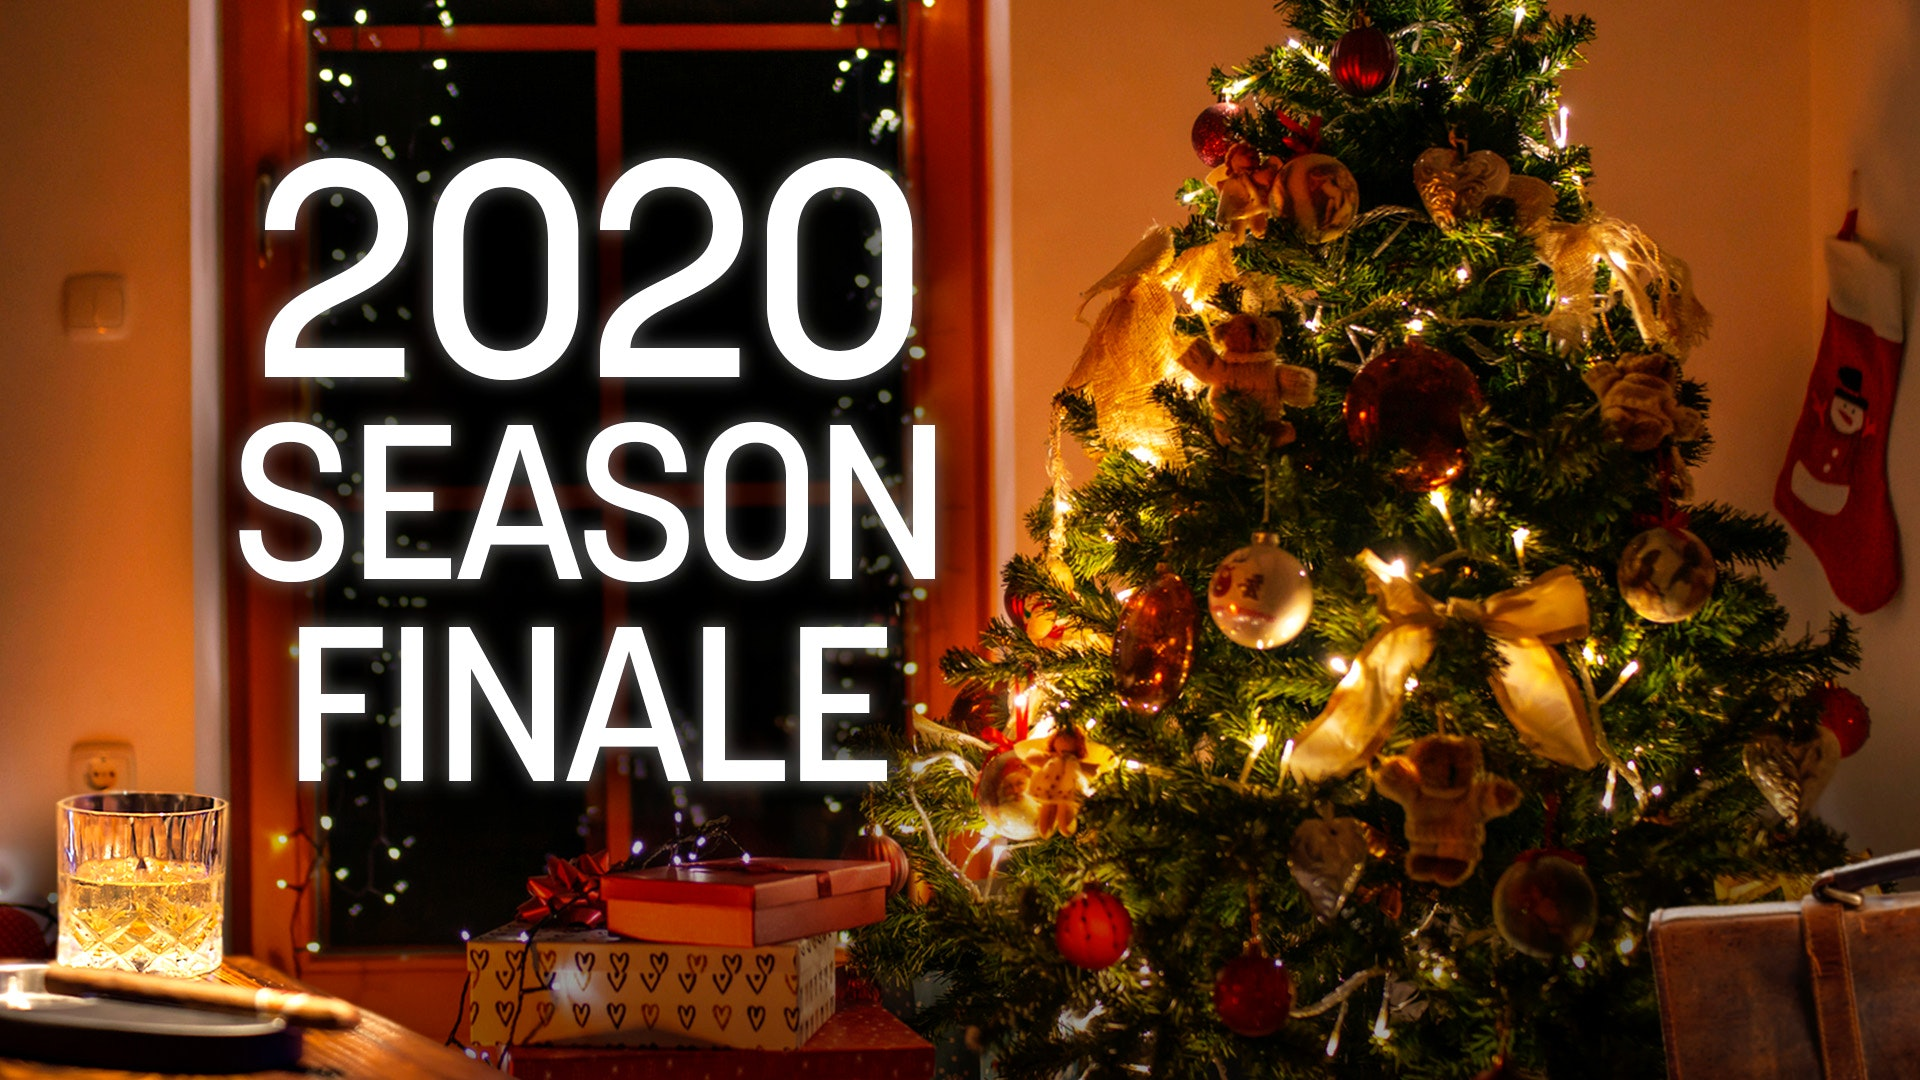 The 2020 Season Finale